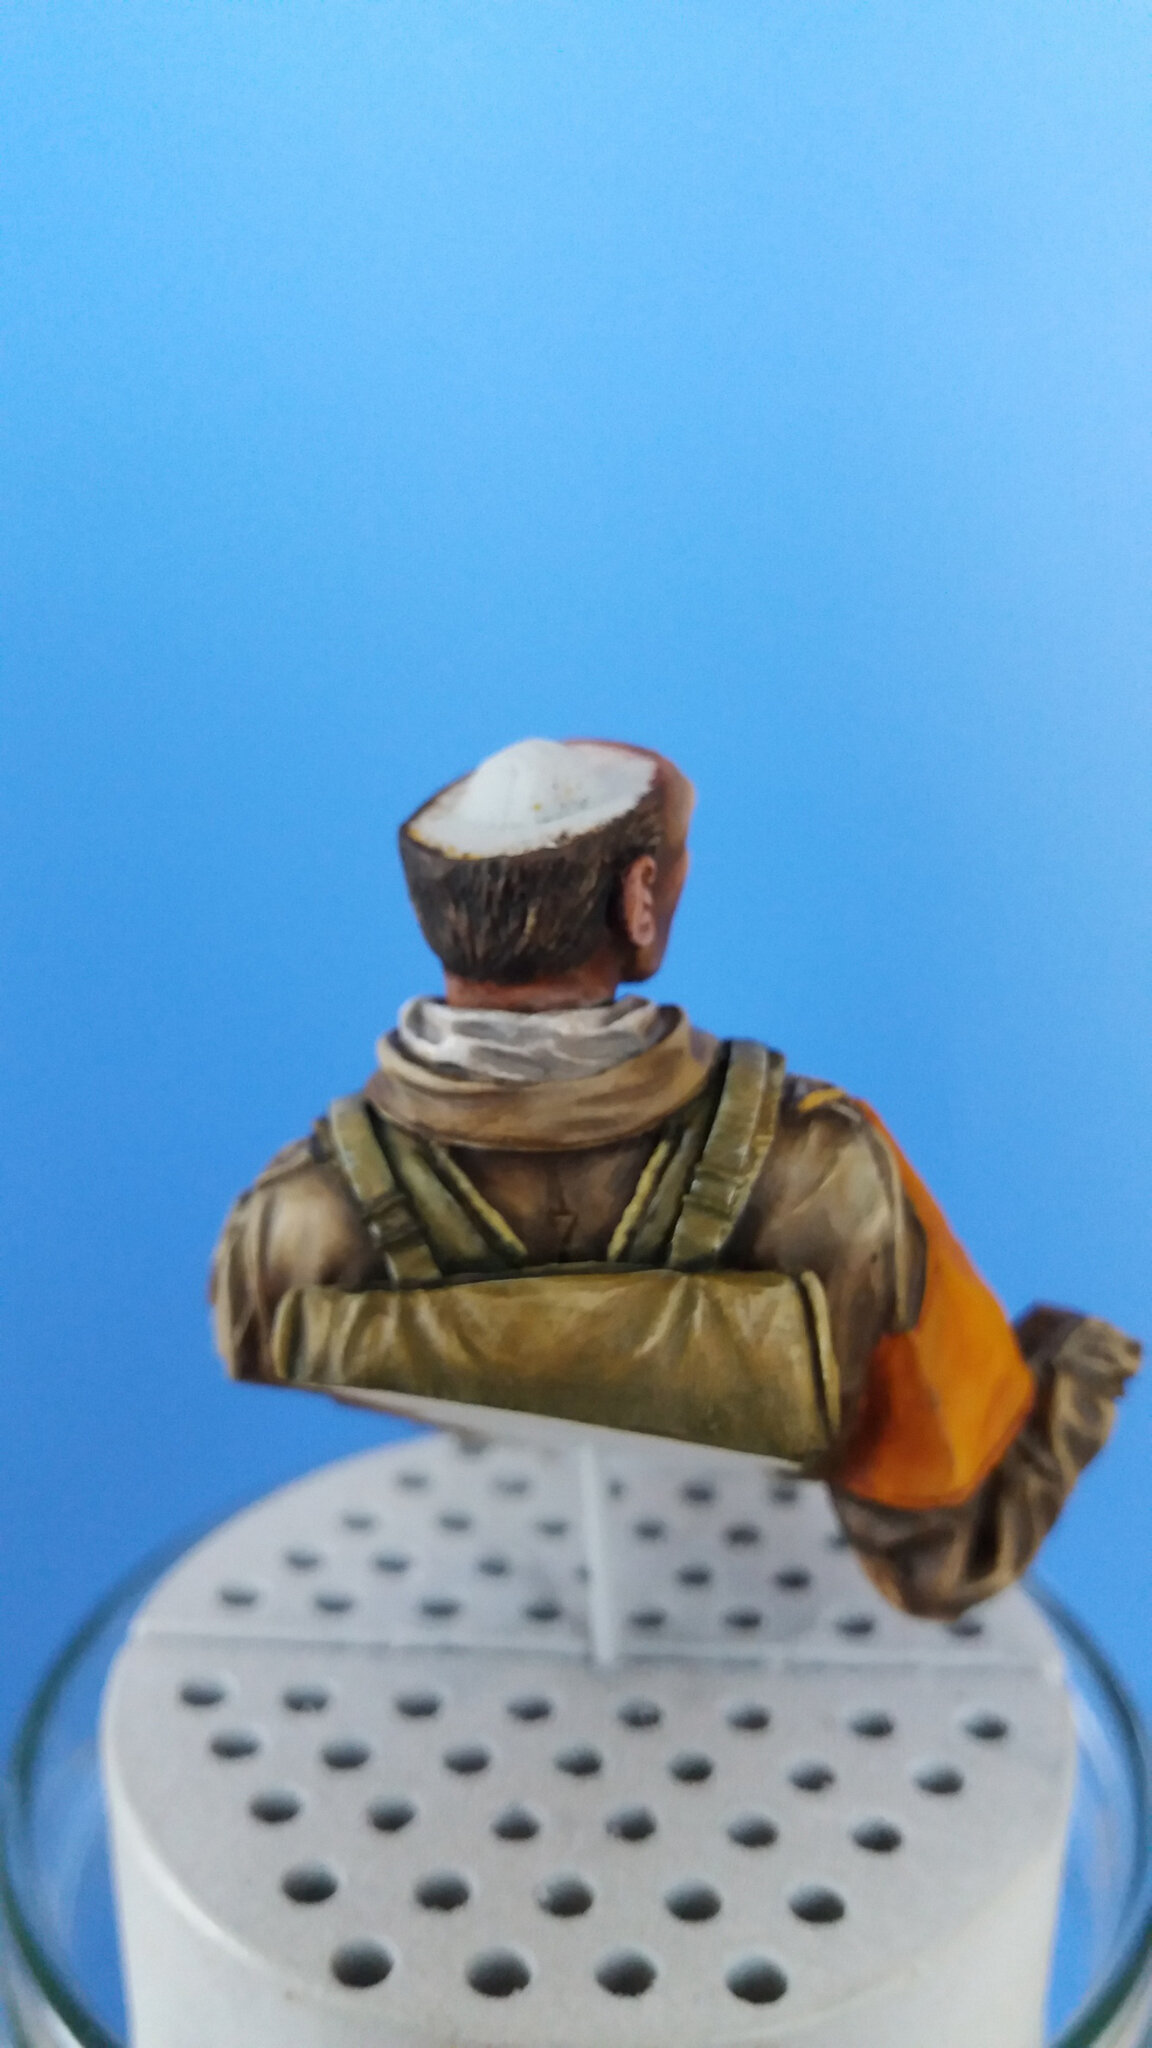 Pathfinder 101eme -1944 - terminé 110906358_o